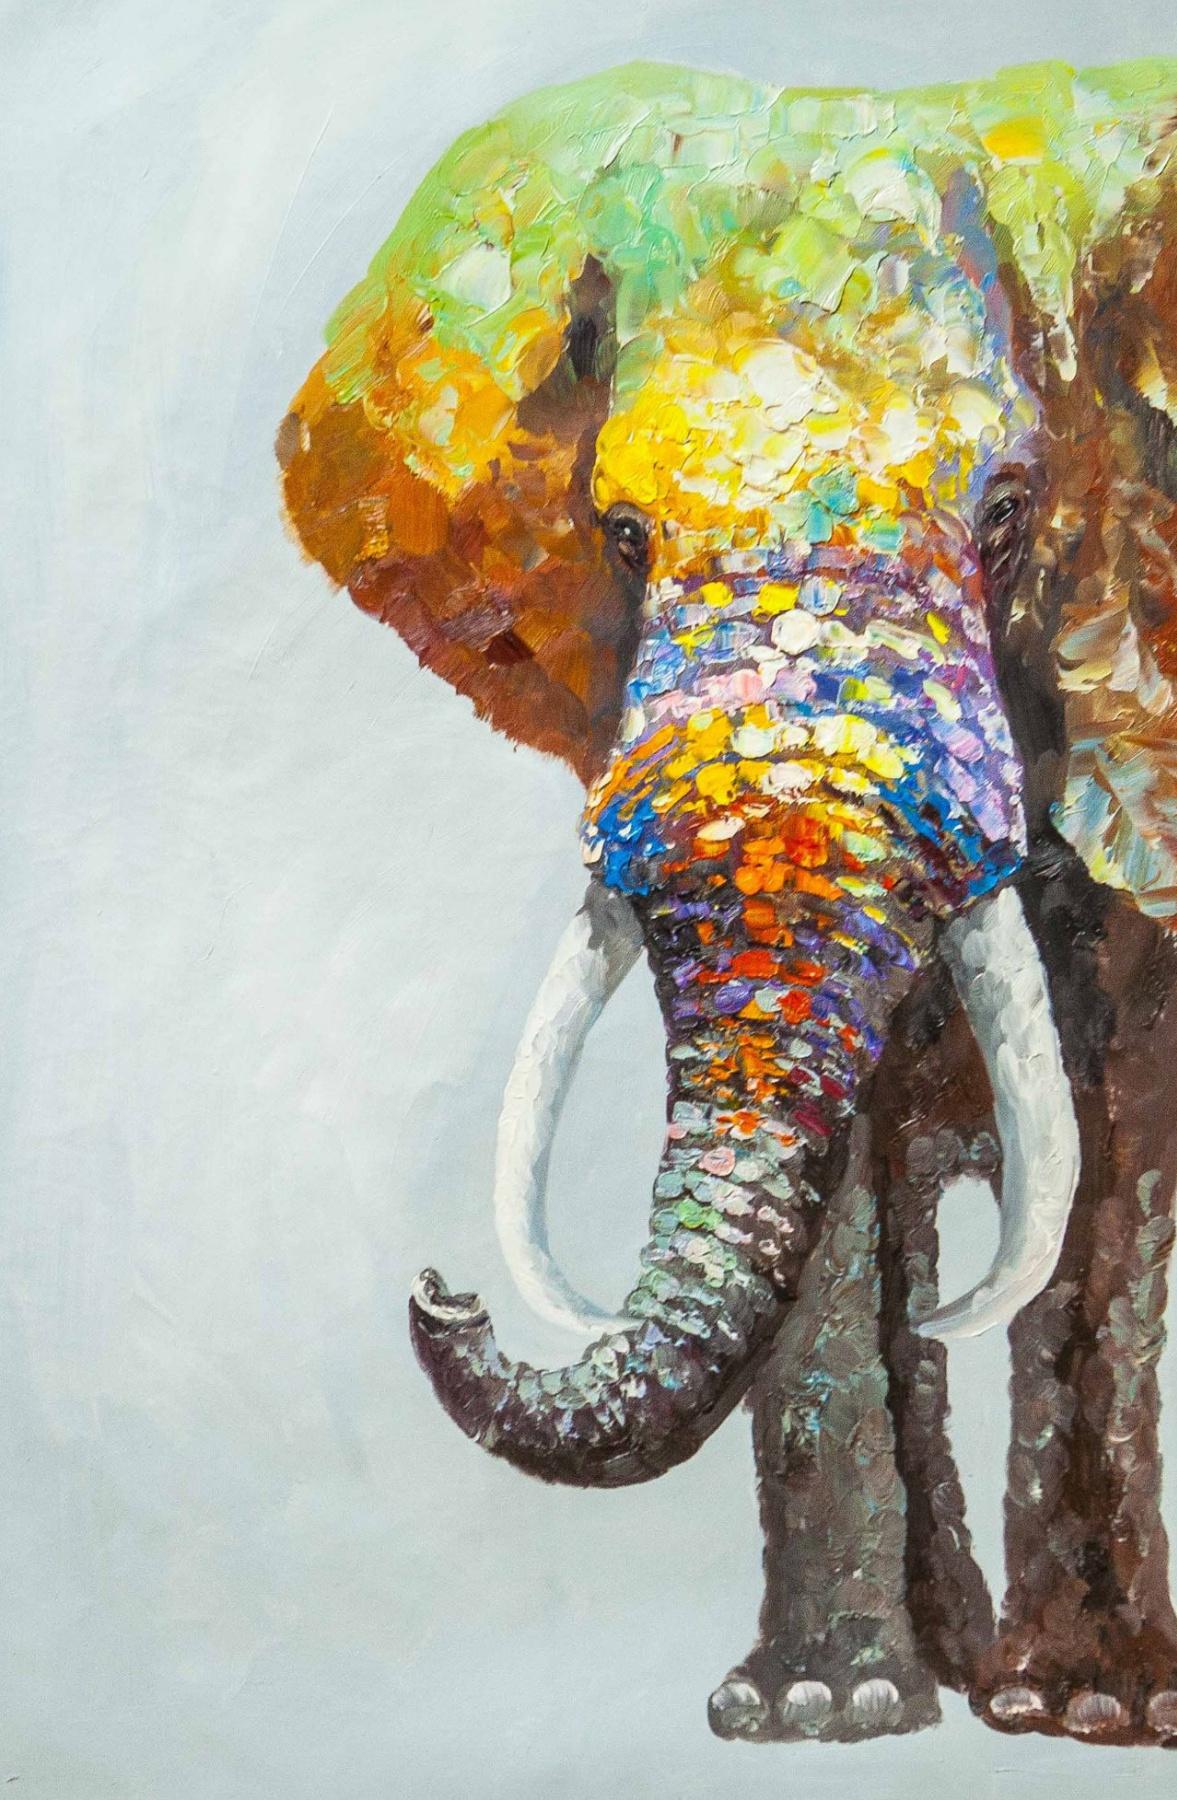 (no name). Multicolored elephant